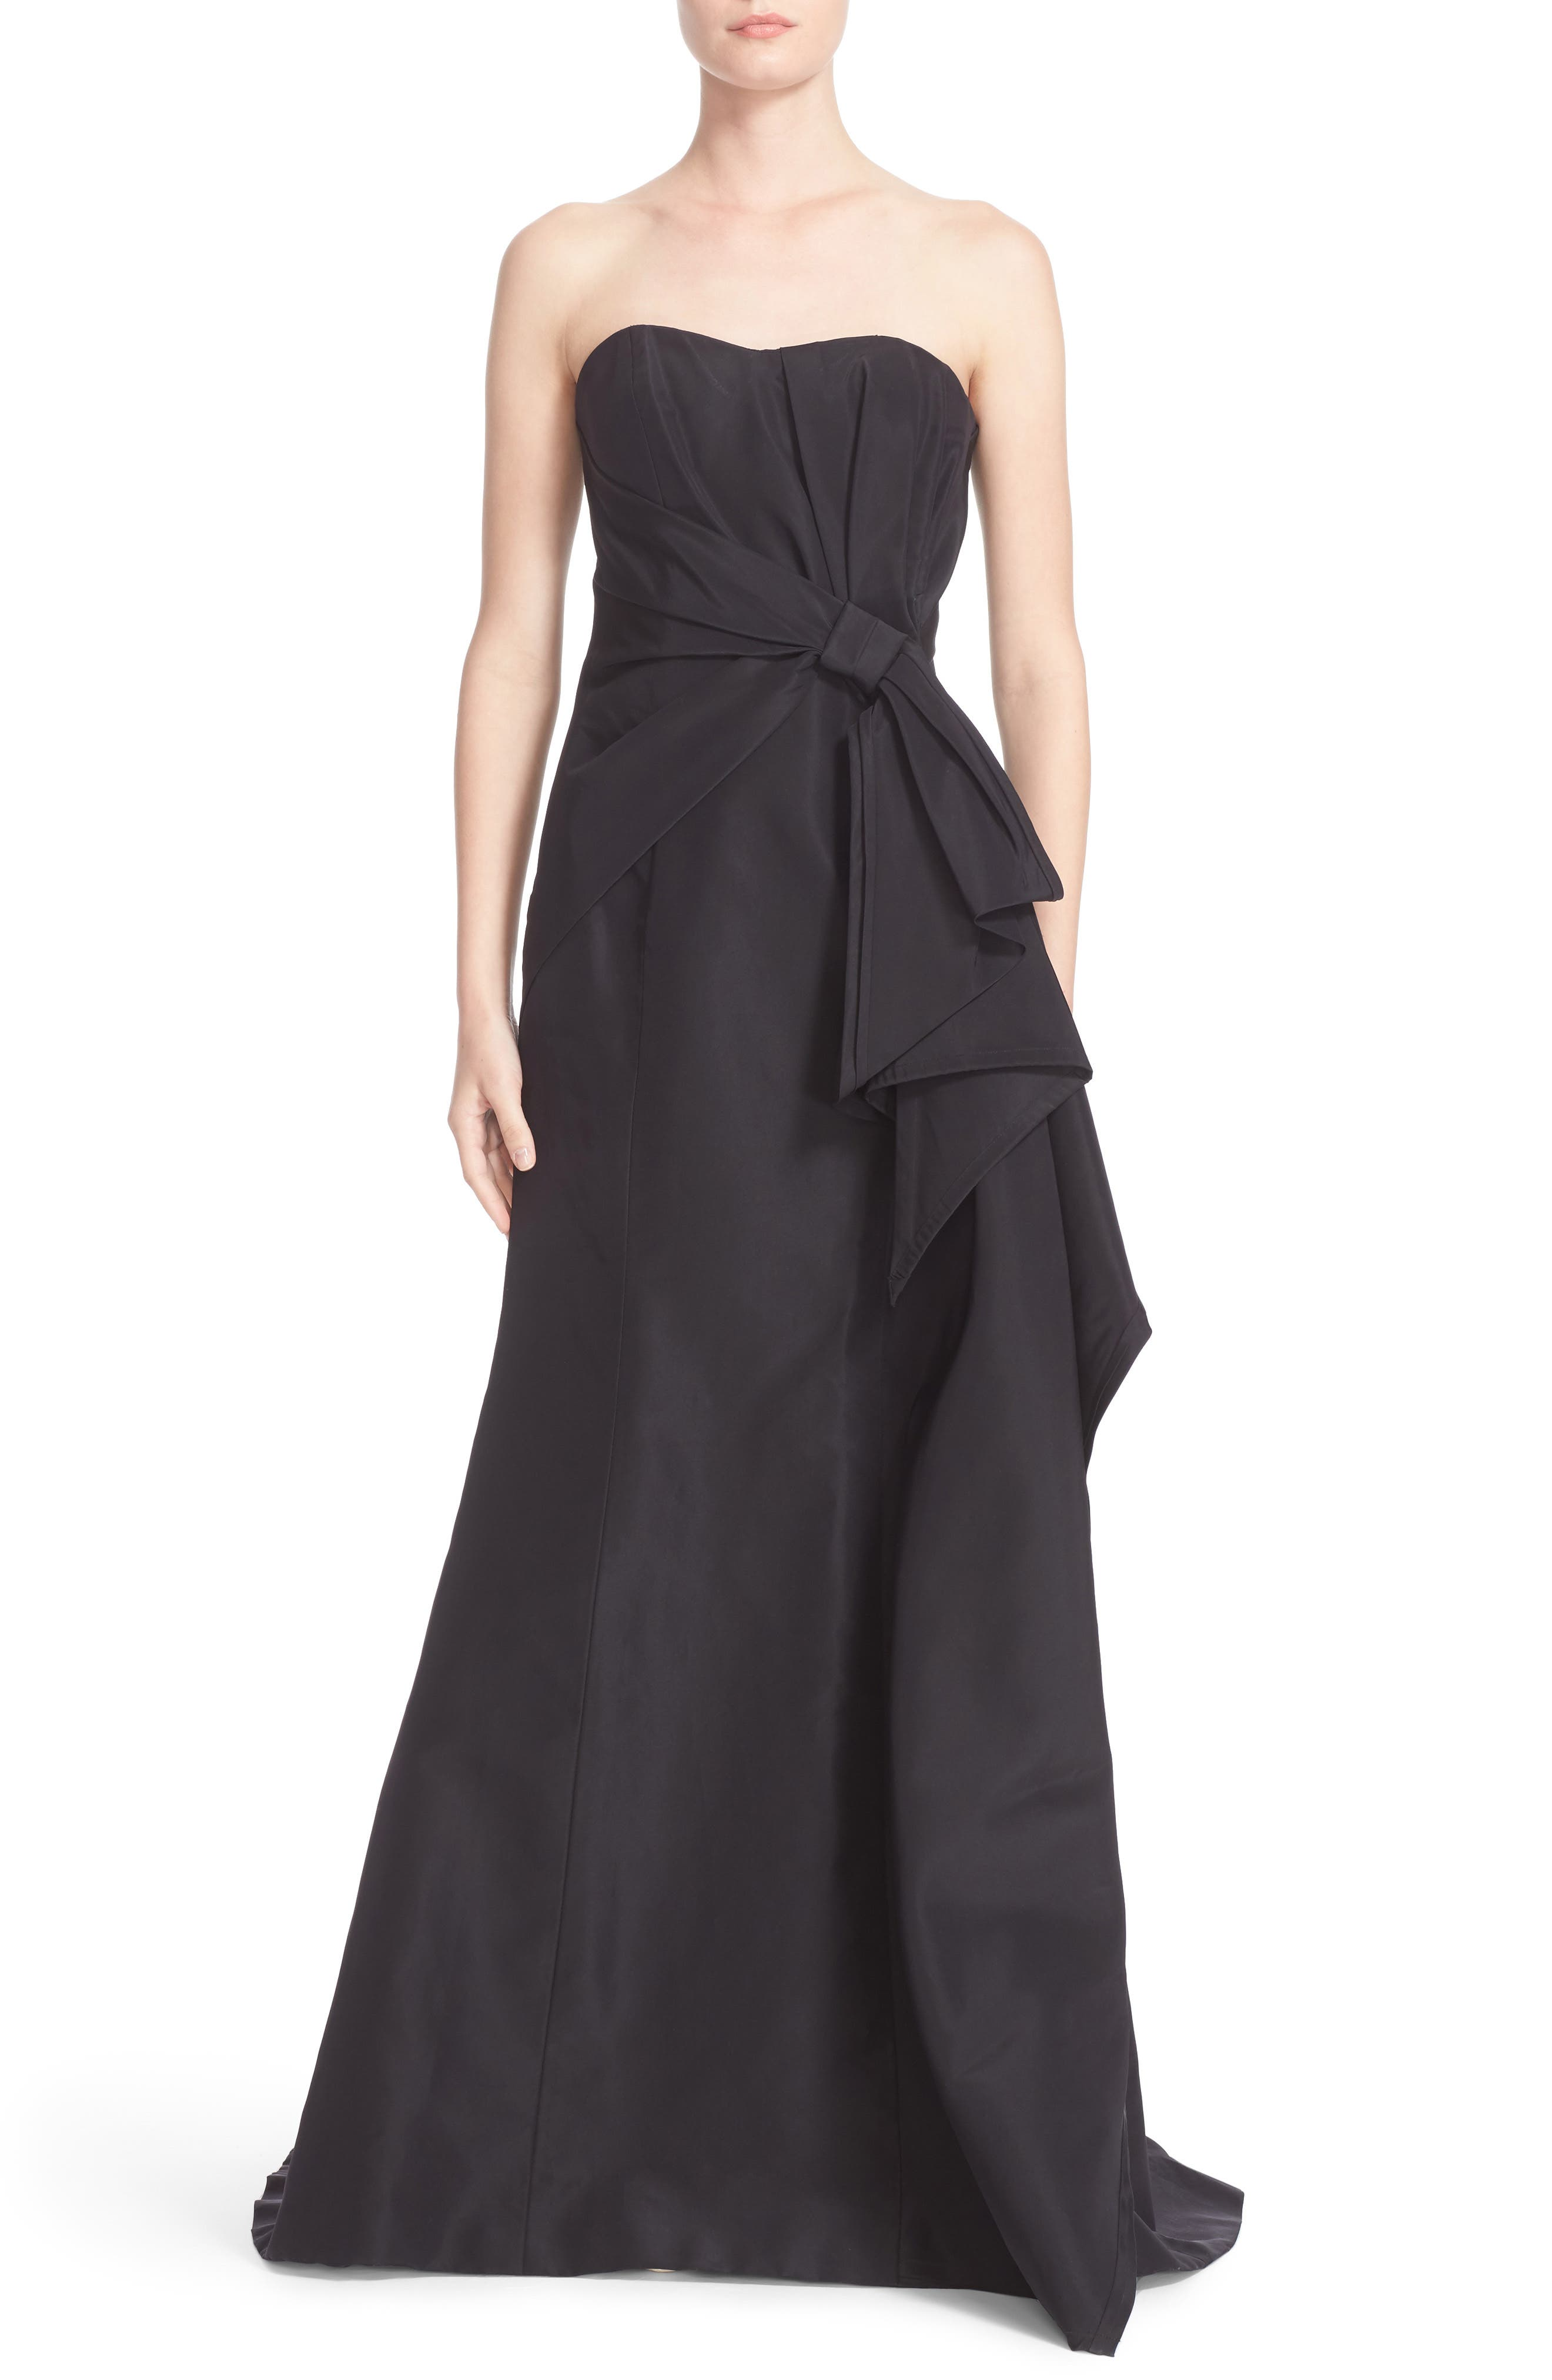 Carolina Herrera Bow Detail Strapless Silk Faille Gown (Nordstrom Exclusive)